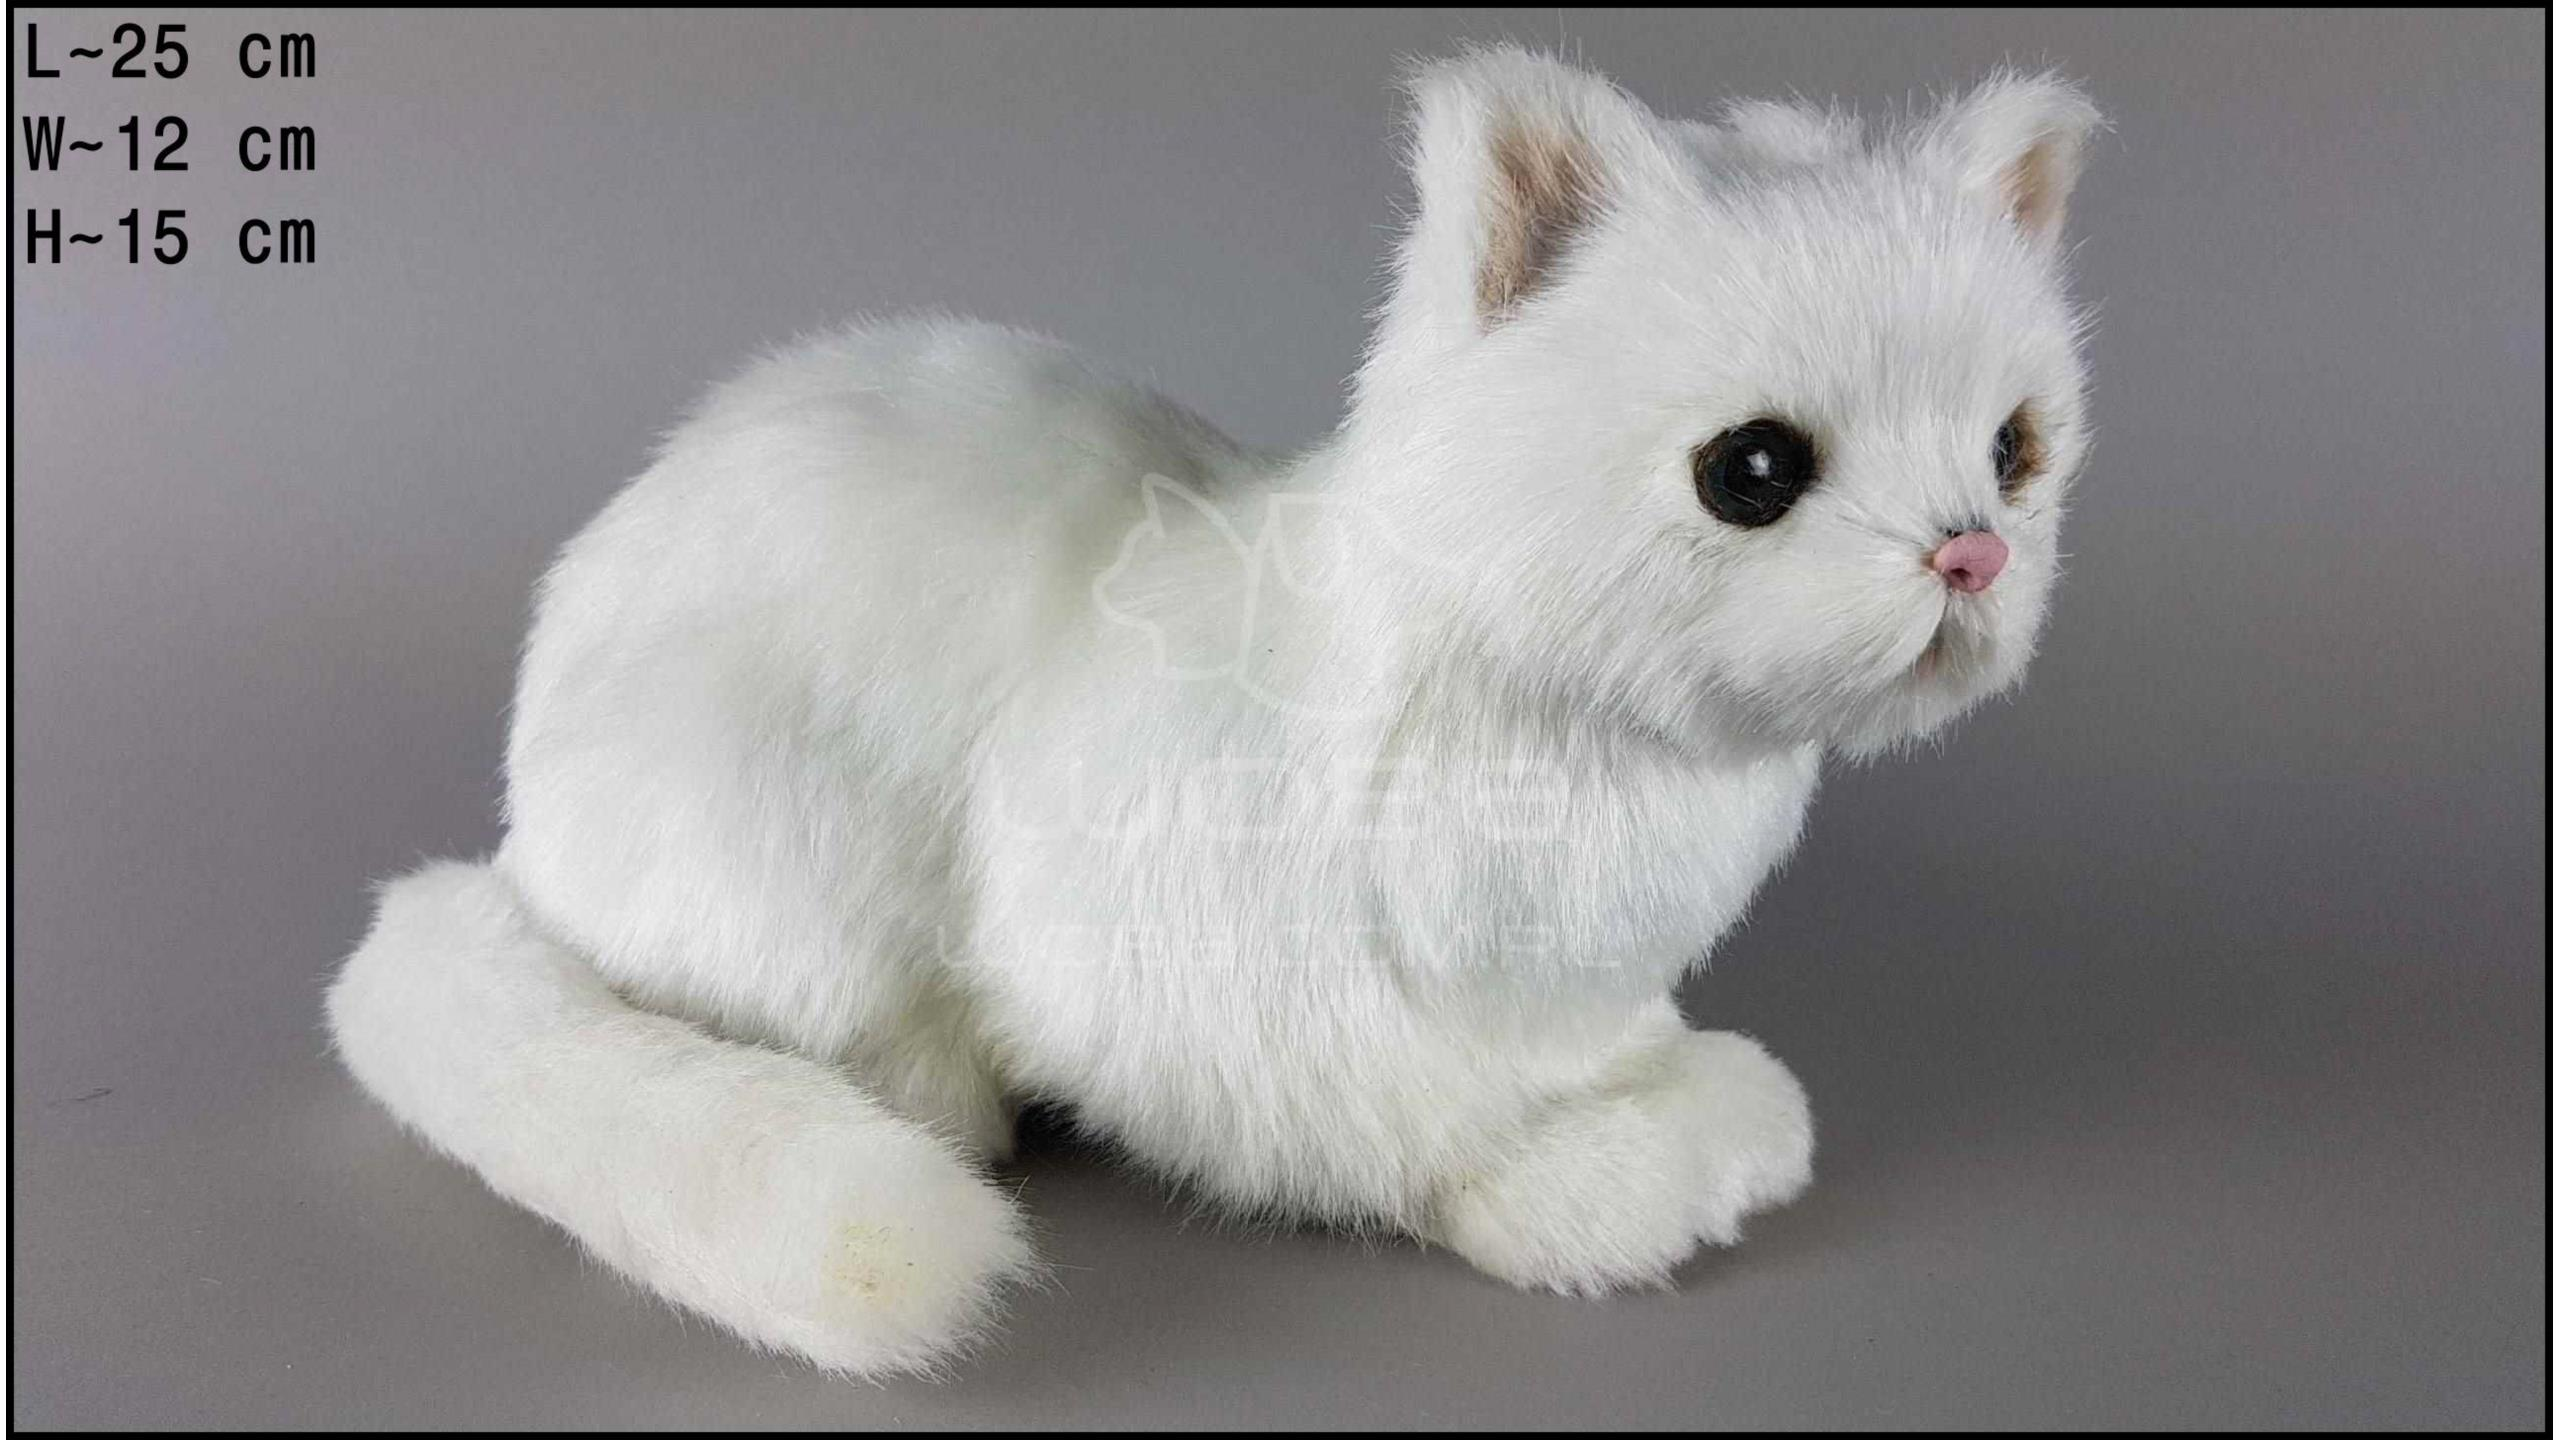 Large cat sitting - White